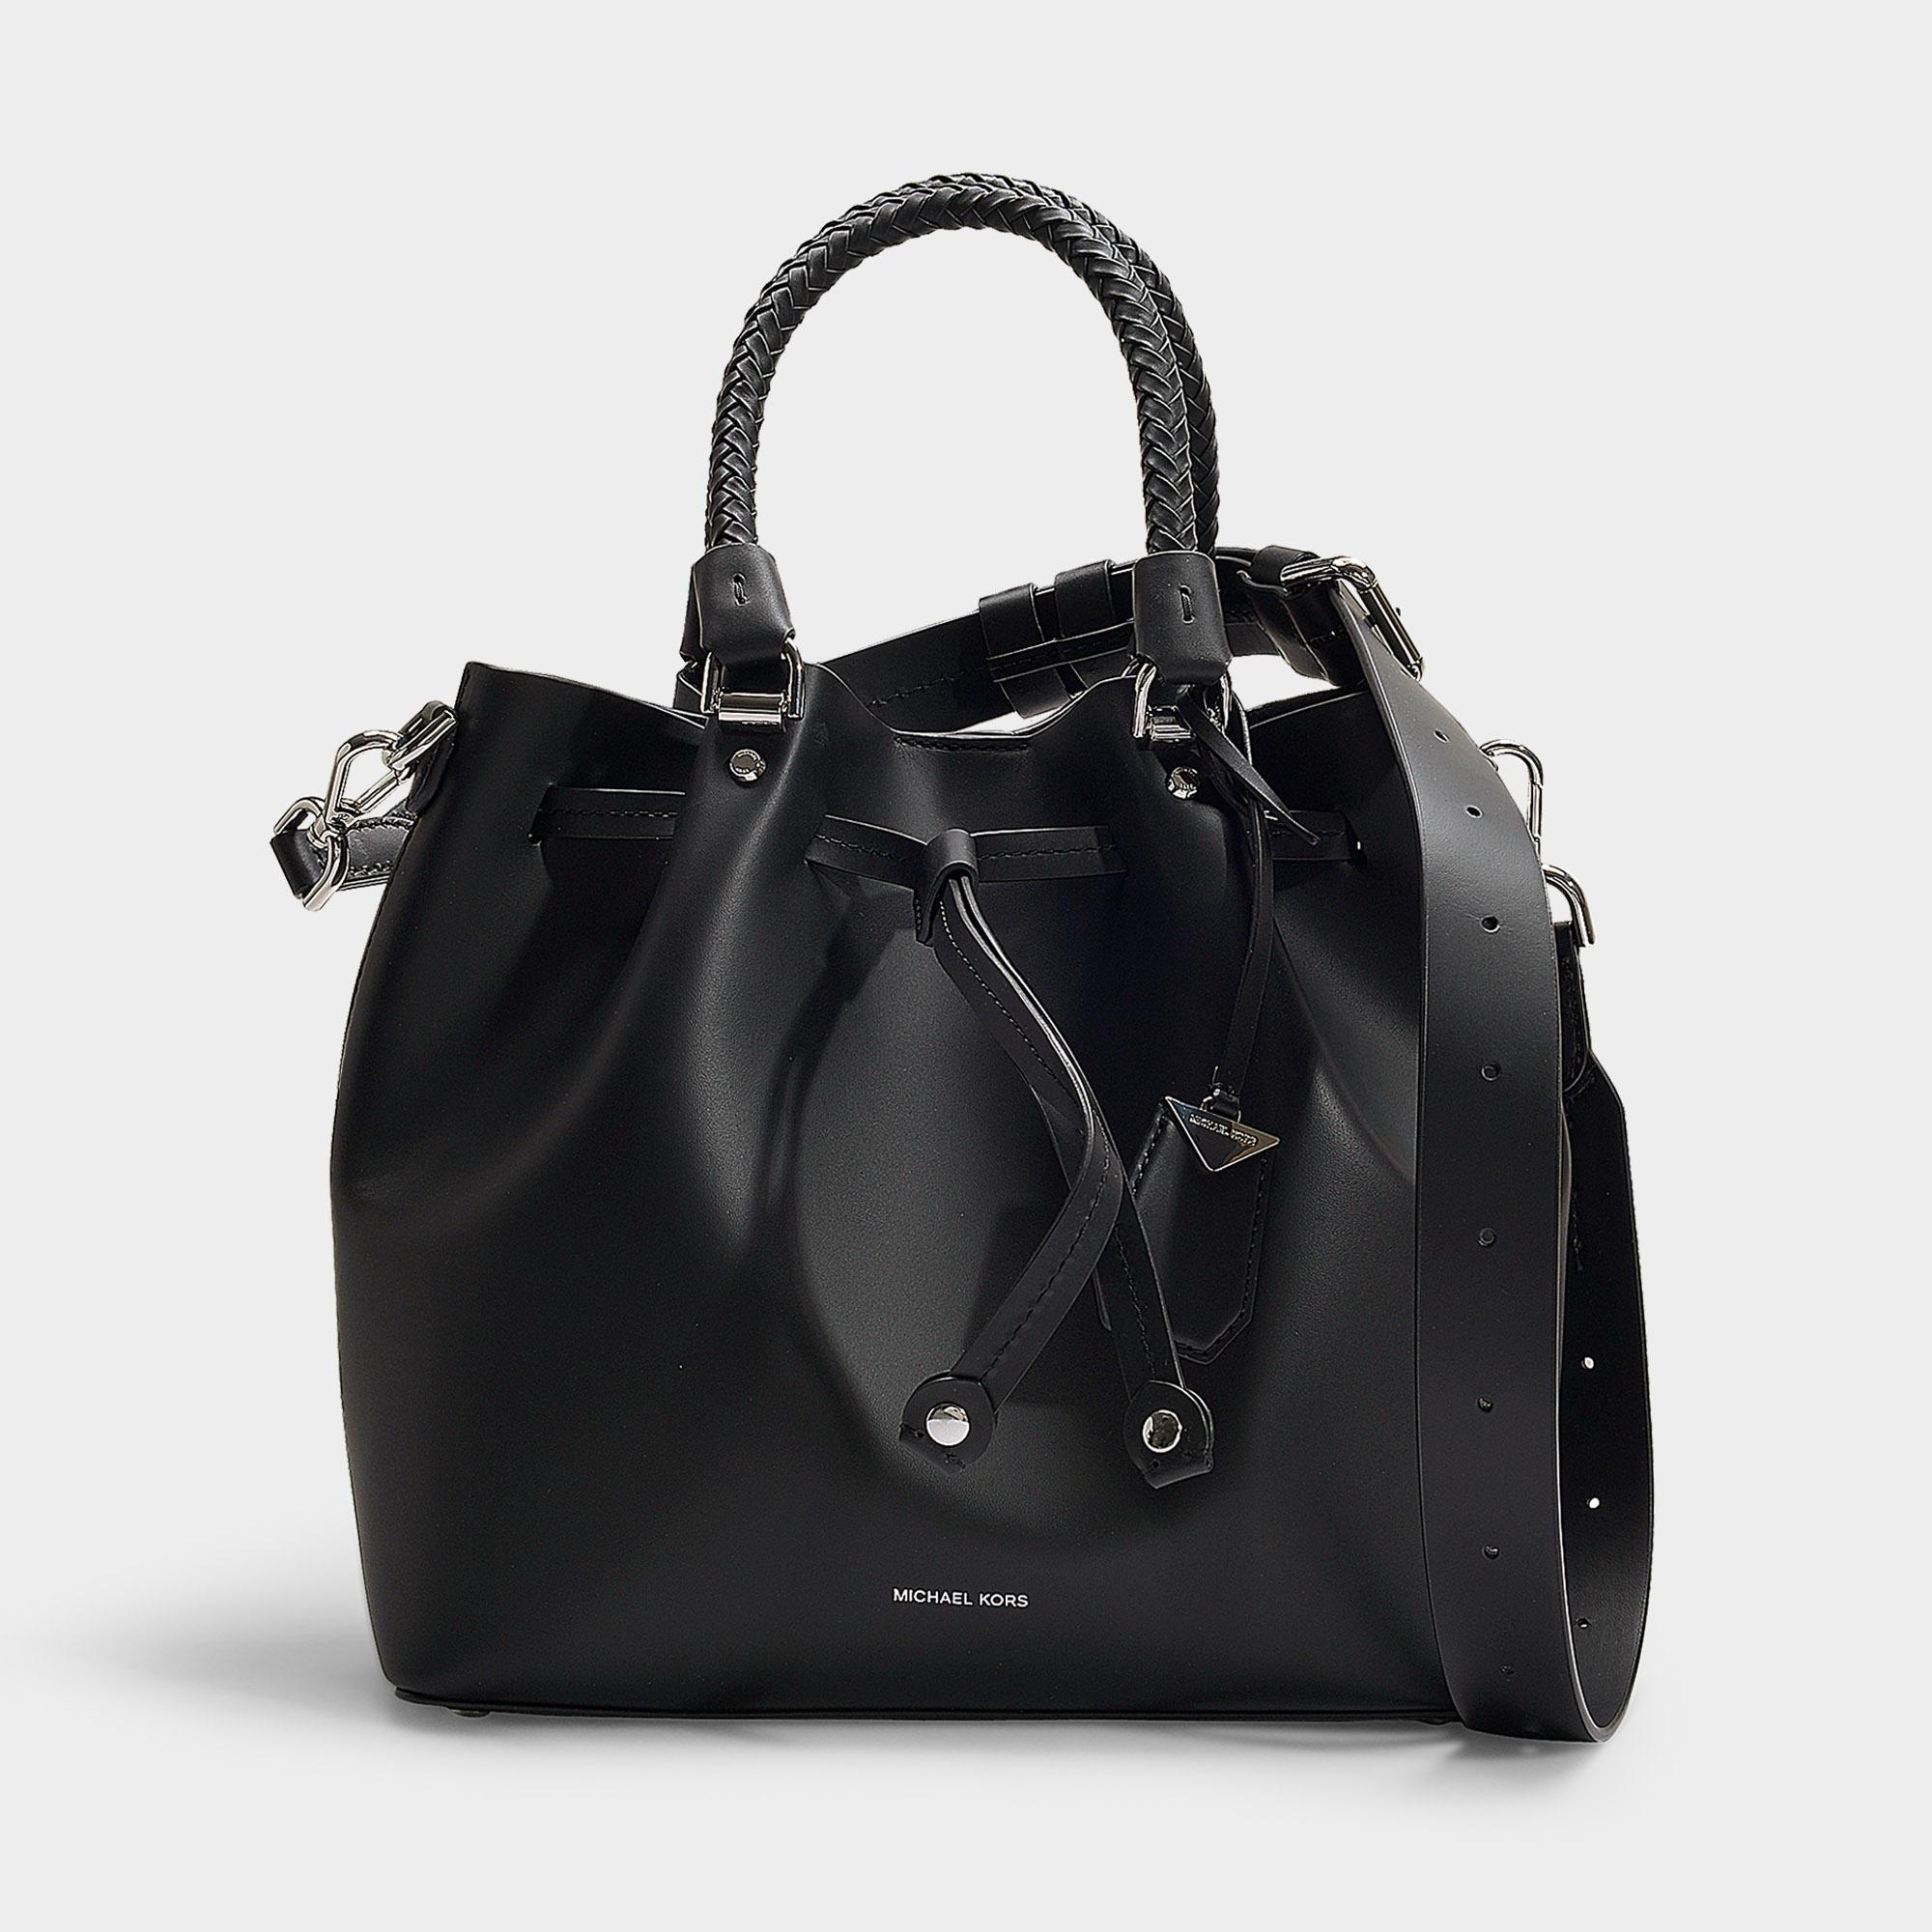 9427d54c9a2ba3 MICHAEL Michael Kors. Women's Blakely Medium Bucket Bag In Black Calfskin